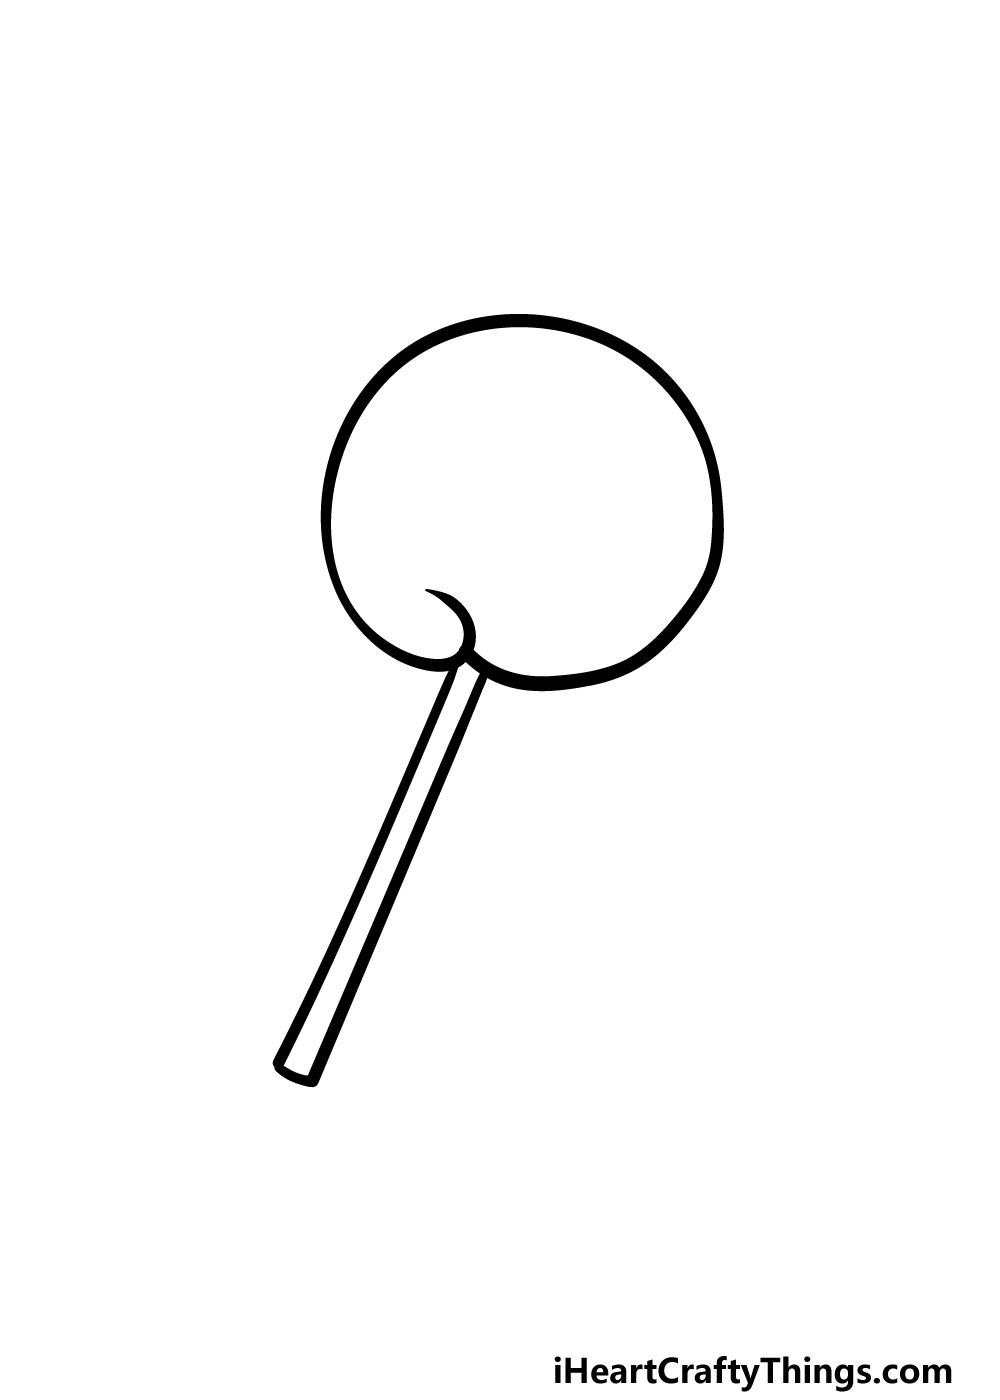 drawing a lollipop step 2